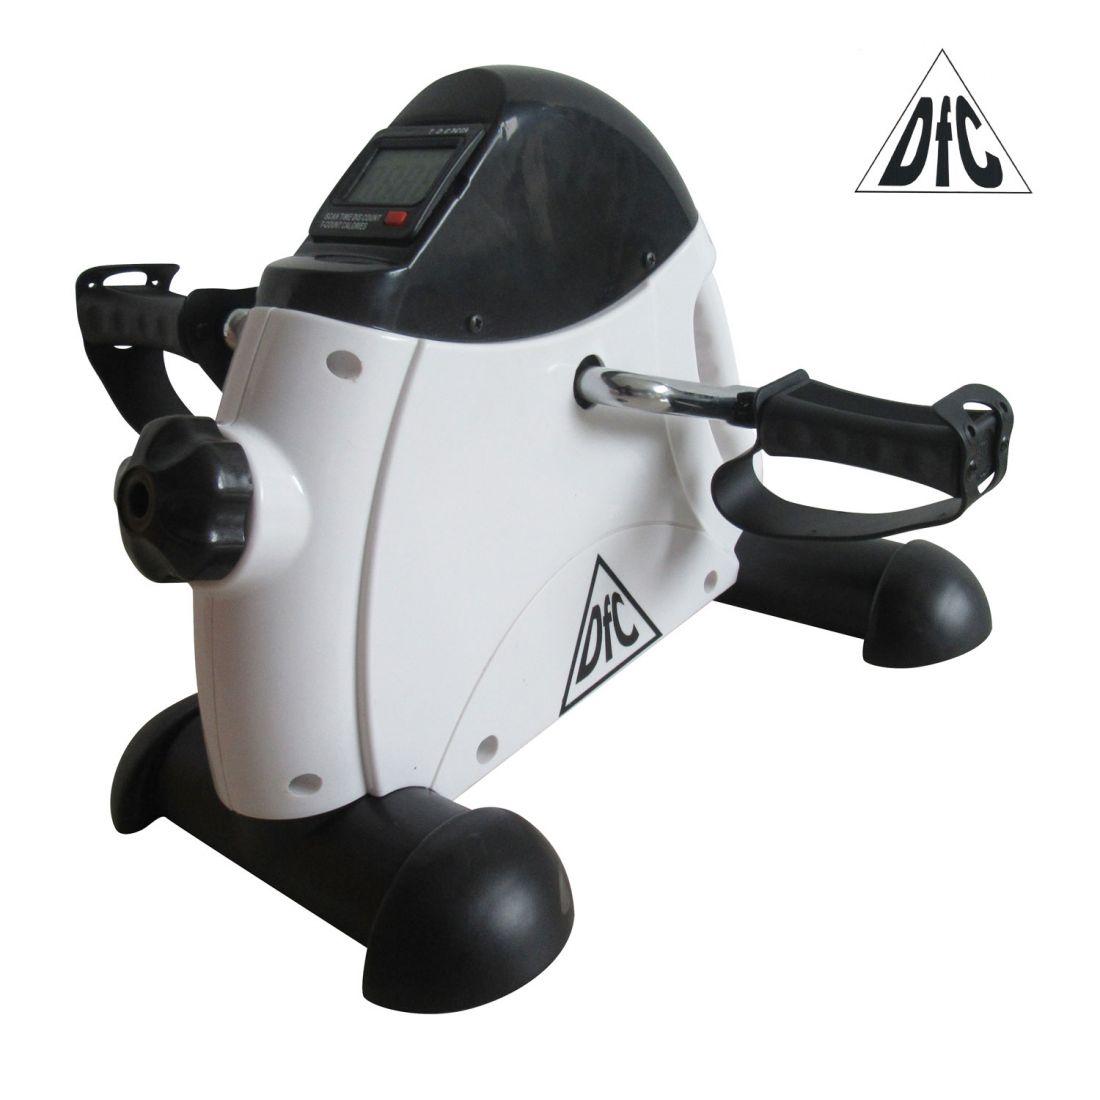 Мини велотренажер - DFC 1.2-1